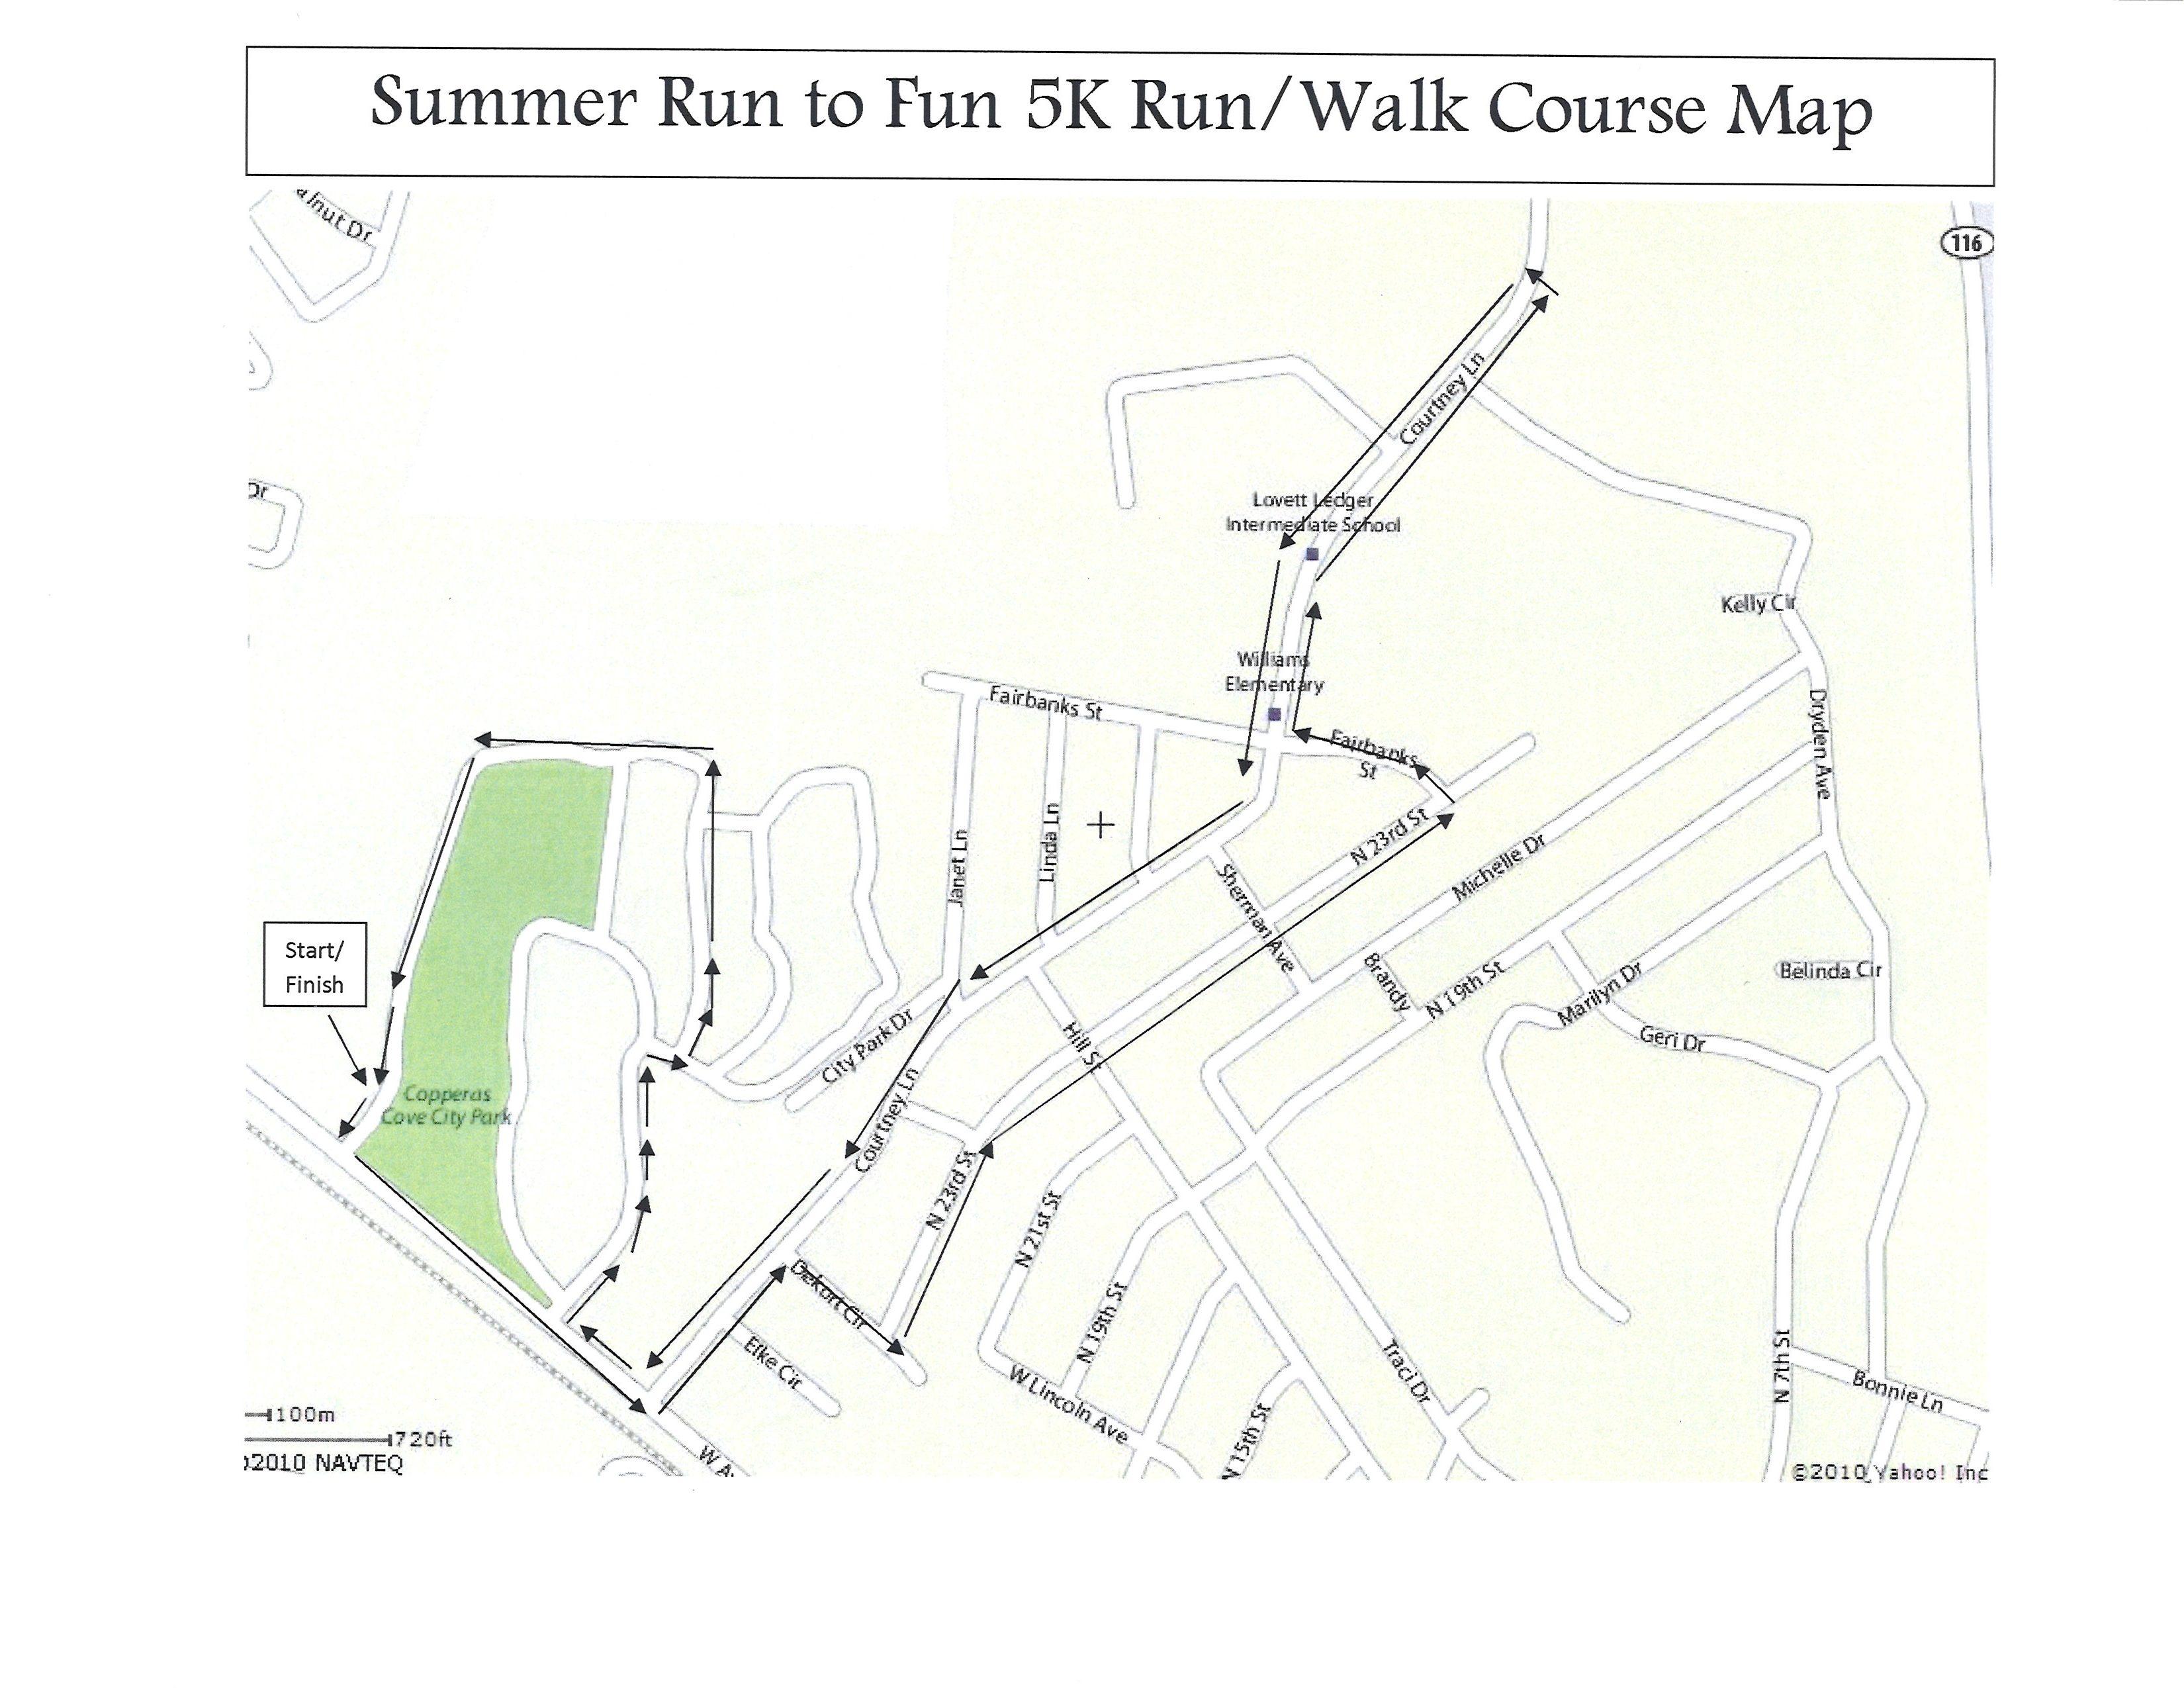 Updated_Summer Run to Fun City Park Map